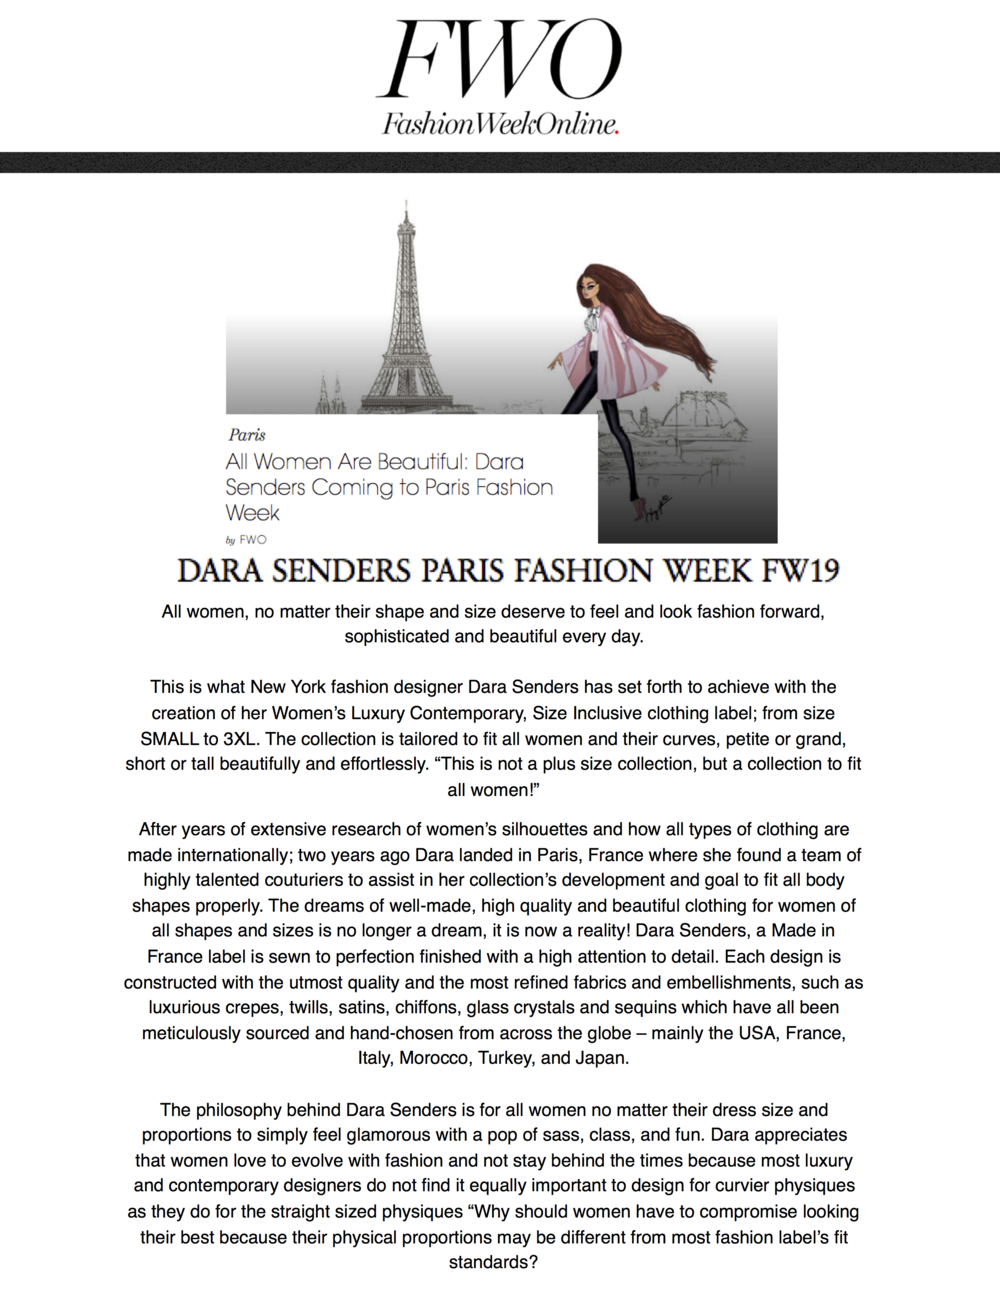 Fashion Week Online - Dara Senders - PFW SS19 Pre-Show.png